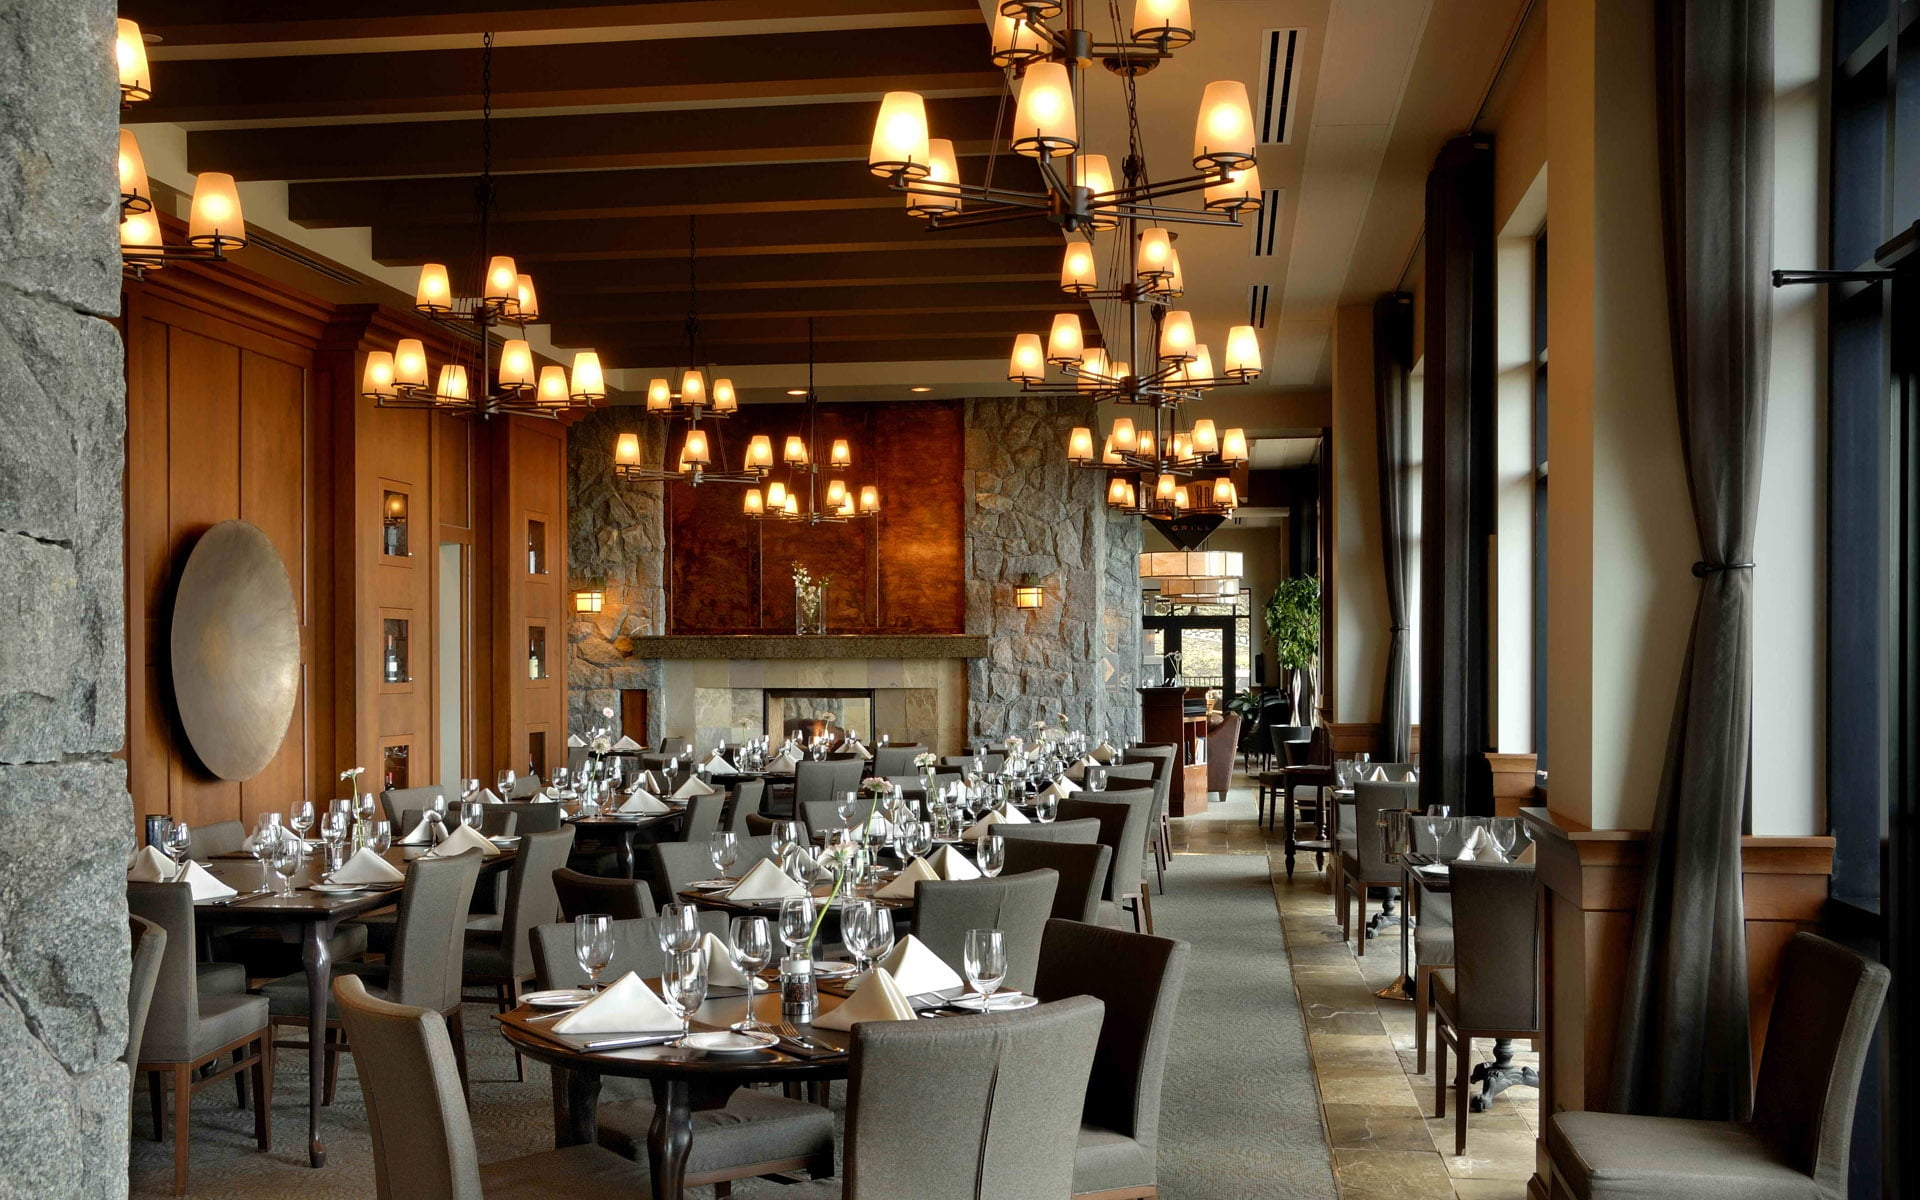 restaurant-cafe-appliances-tables-wallpaper.jpg